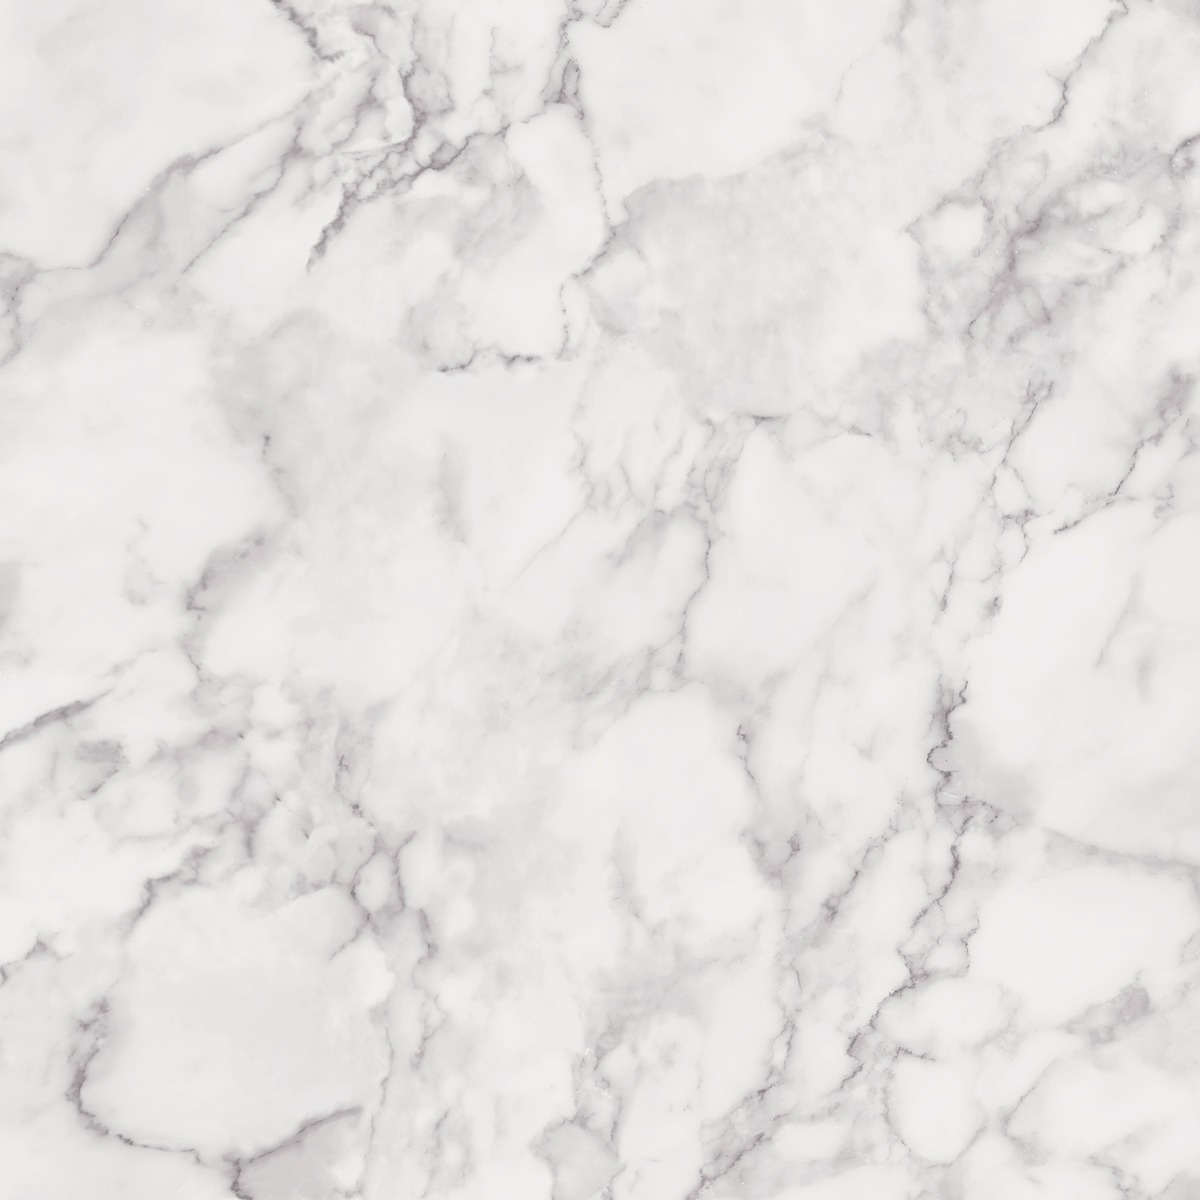 Marblesque Plain Marble Wallpaper White Fine Decor FD42274 1200x1200